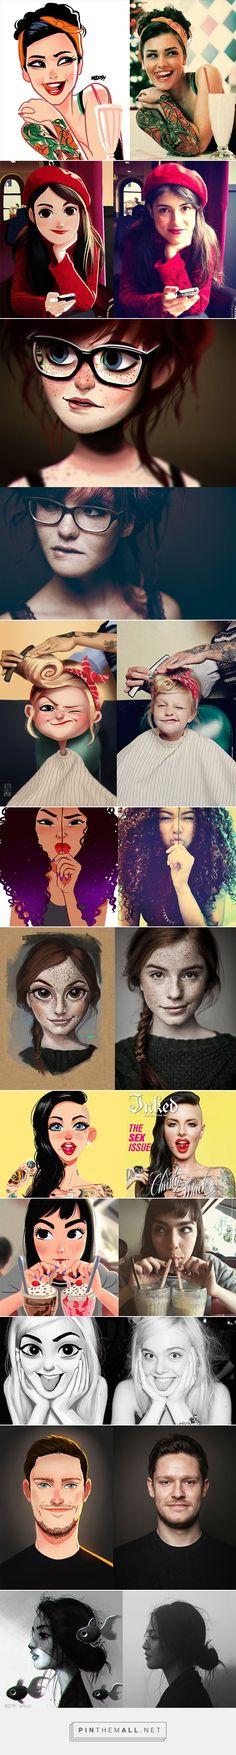 Stunning Digital Art Paintings of Random People – A Fun Series by Julio Cesar - created via http://pinthemall.net                                                                                                                                                                                 Más